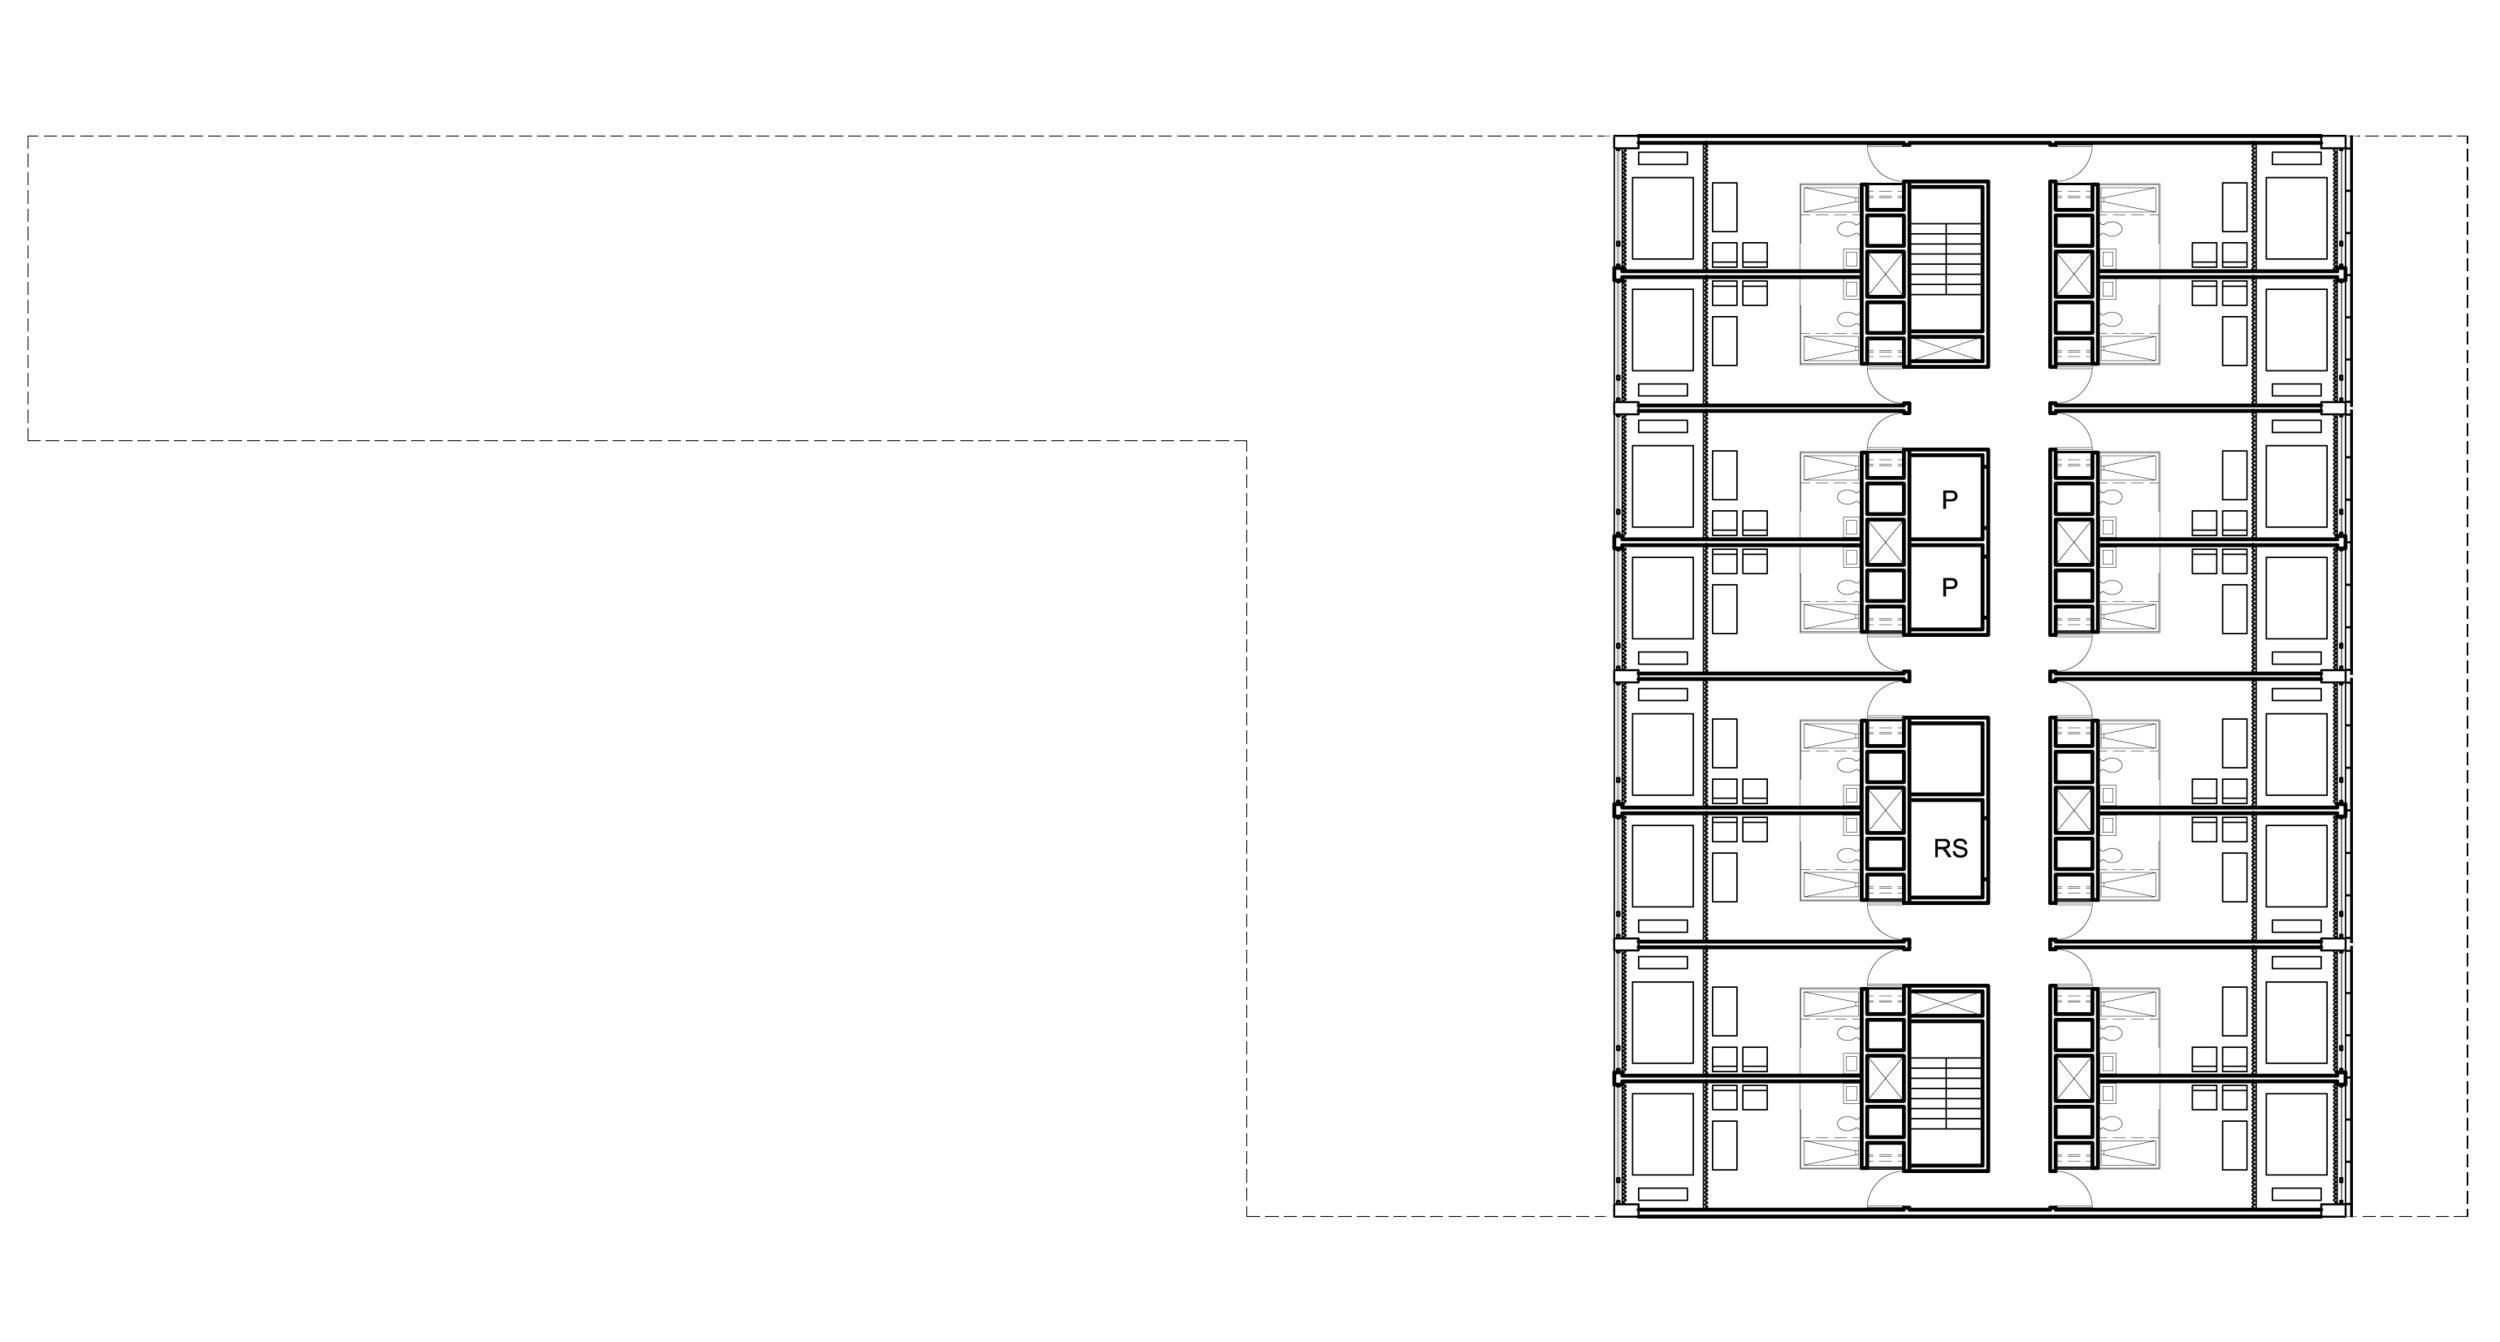 00021typplan1.jpg